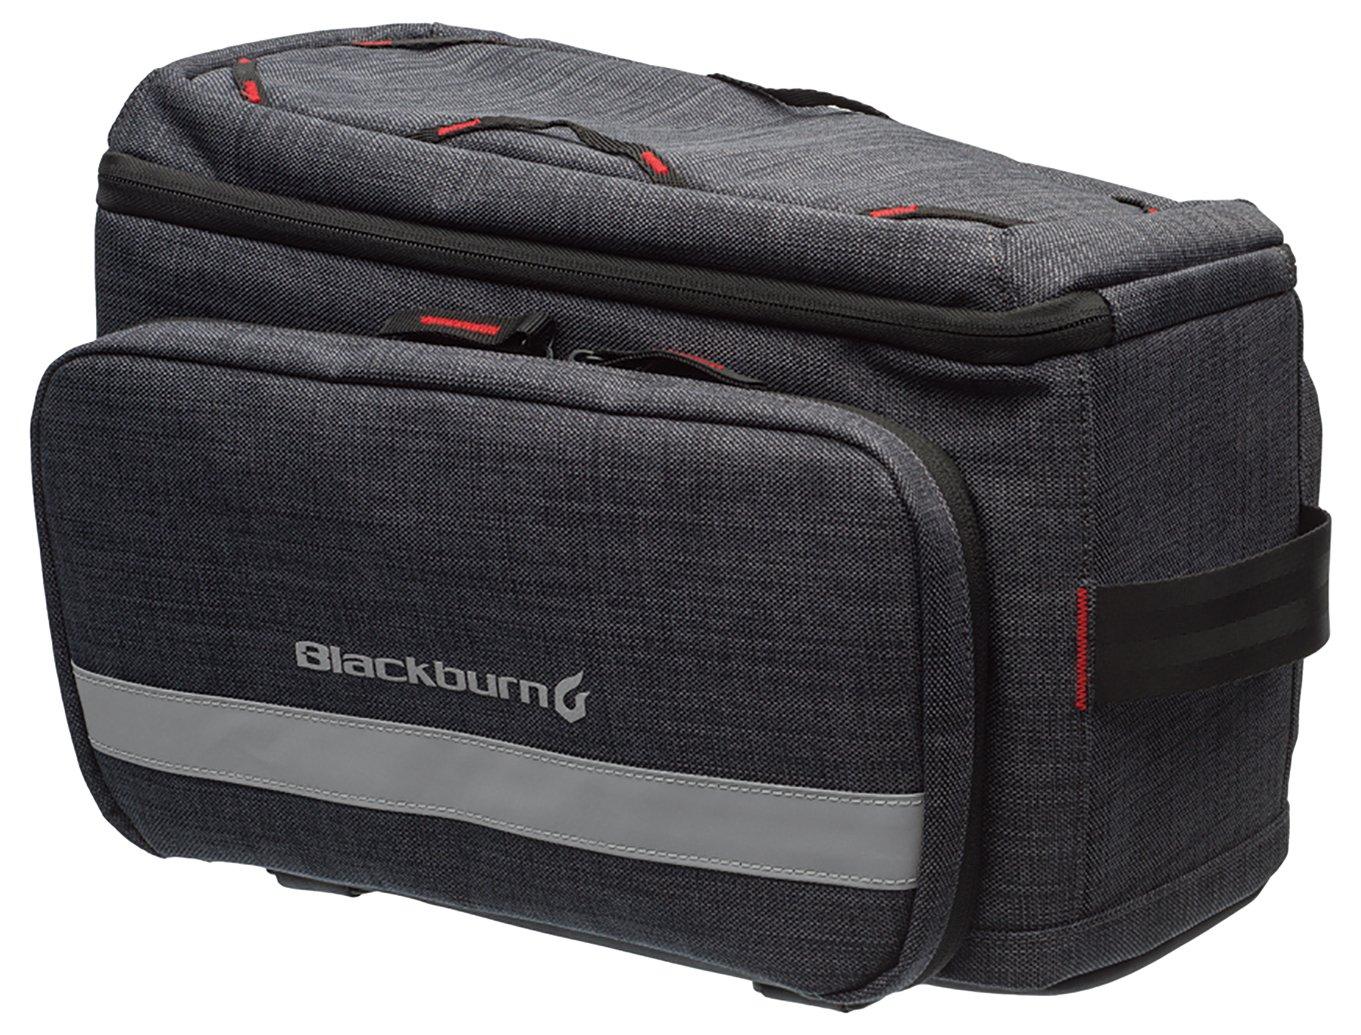 Blackburn(ブラックバーン) CENTRAL TRUNK RACK TOP BAG セントラル トランクラックトップ バッグ チャコール 7068192   B0141E7QLG